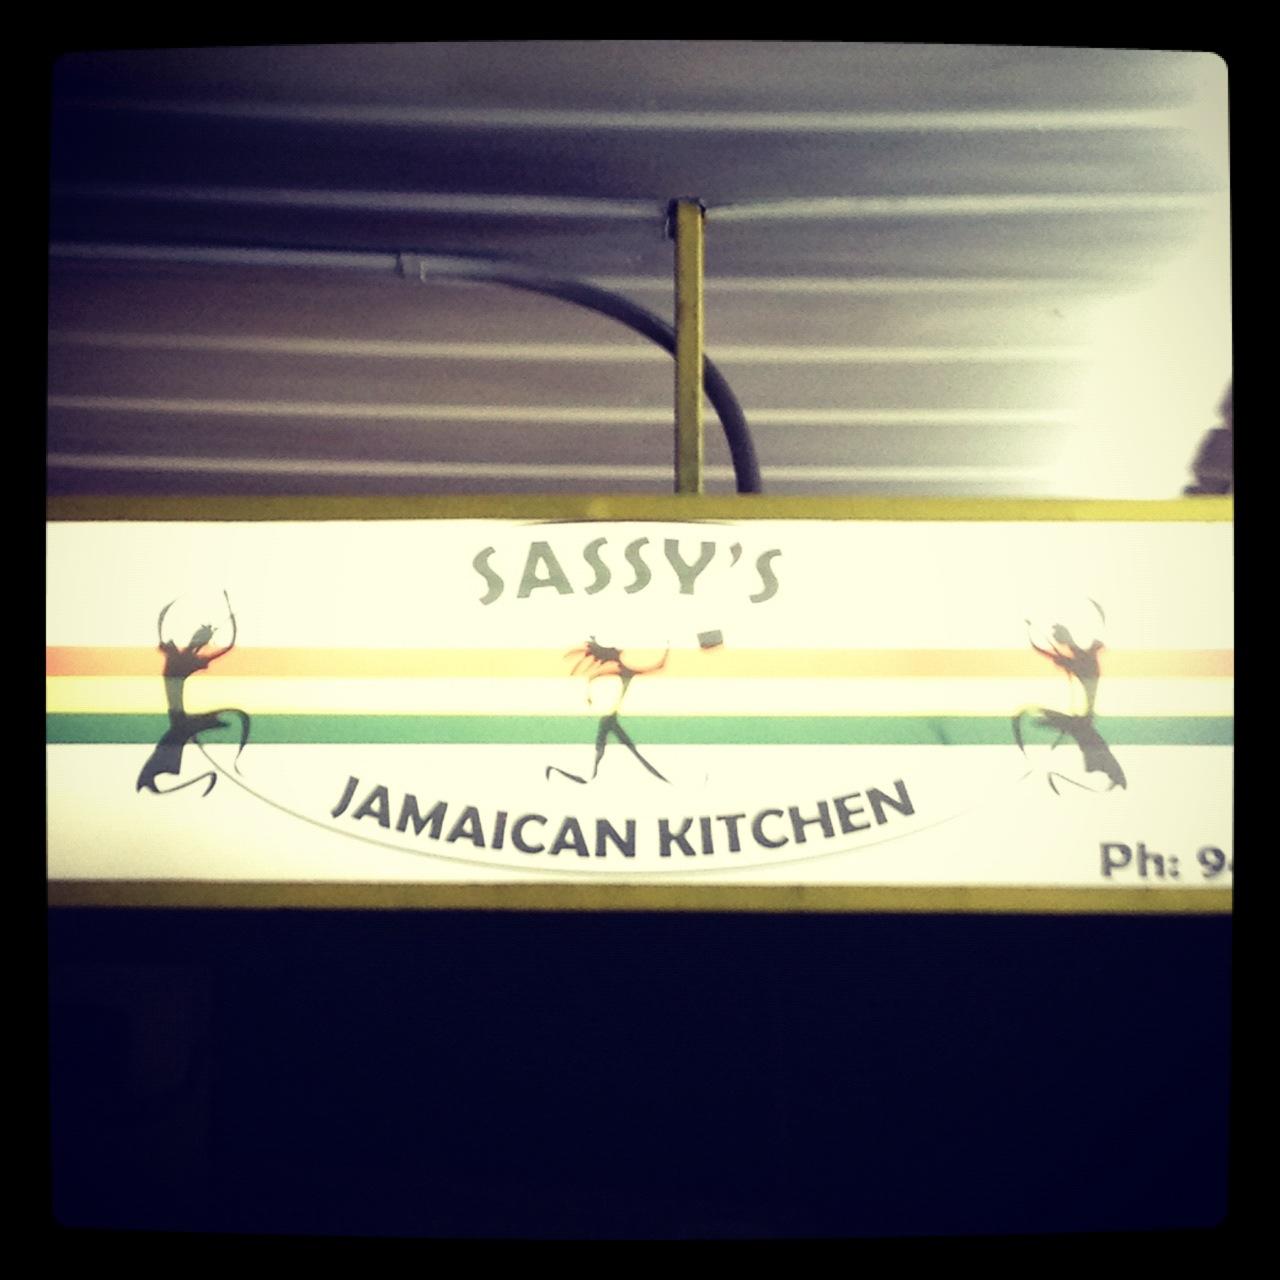 Suburban Culinary Adventures: Sassy's Jamaican Kitchen